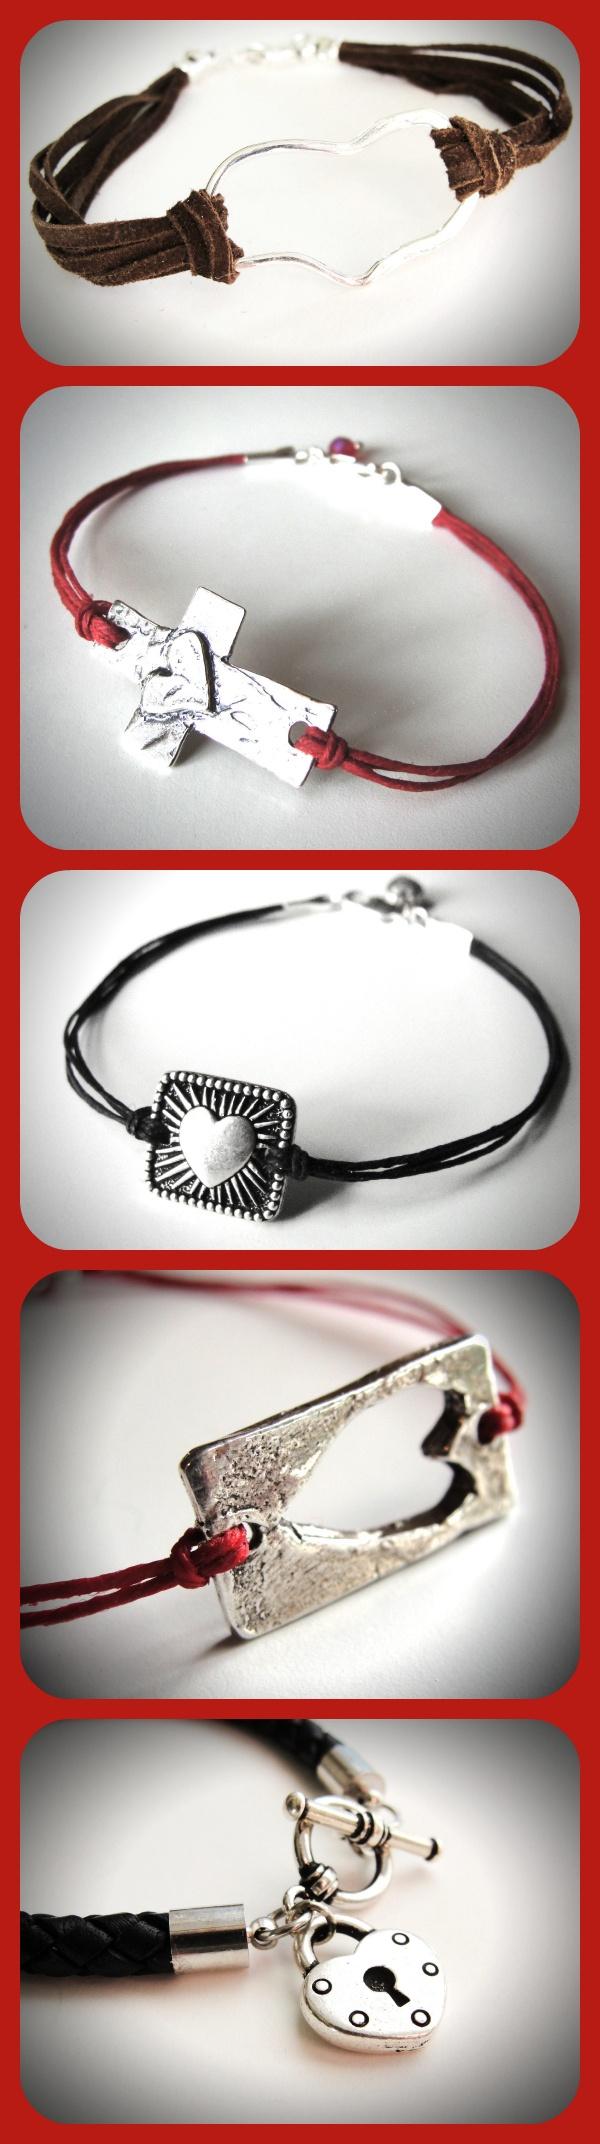 Sterling, linen or leather Heart bracelets from JewelryByMaeBee on Etsy.